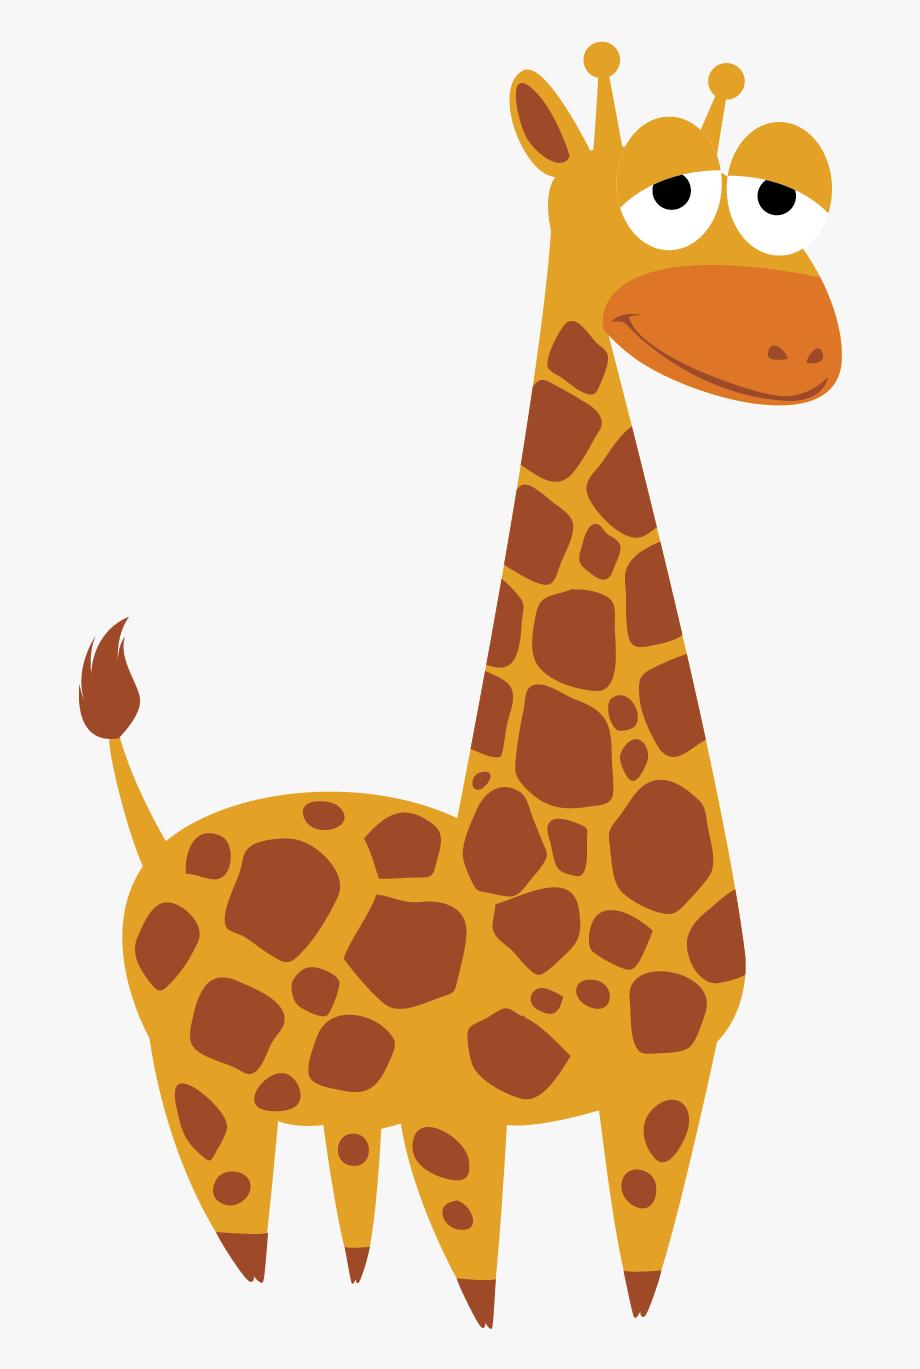 Giraffe clipart group giraffe. Oranges animals animal cartoon